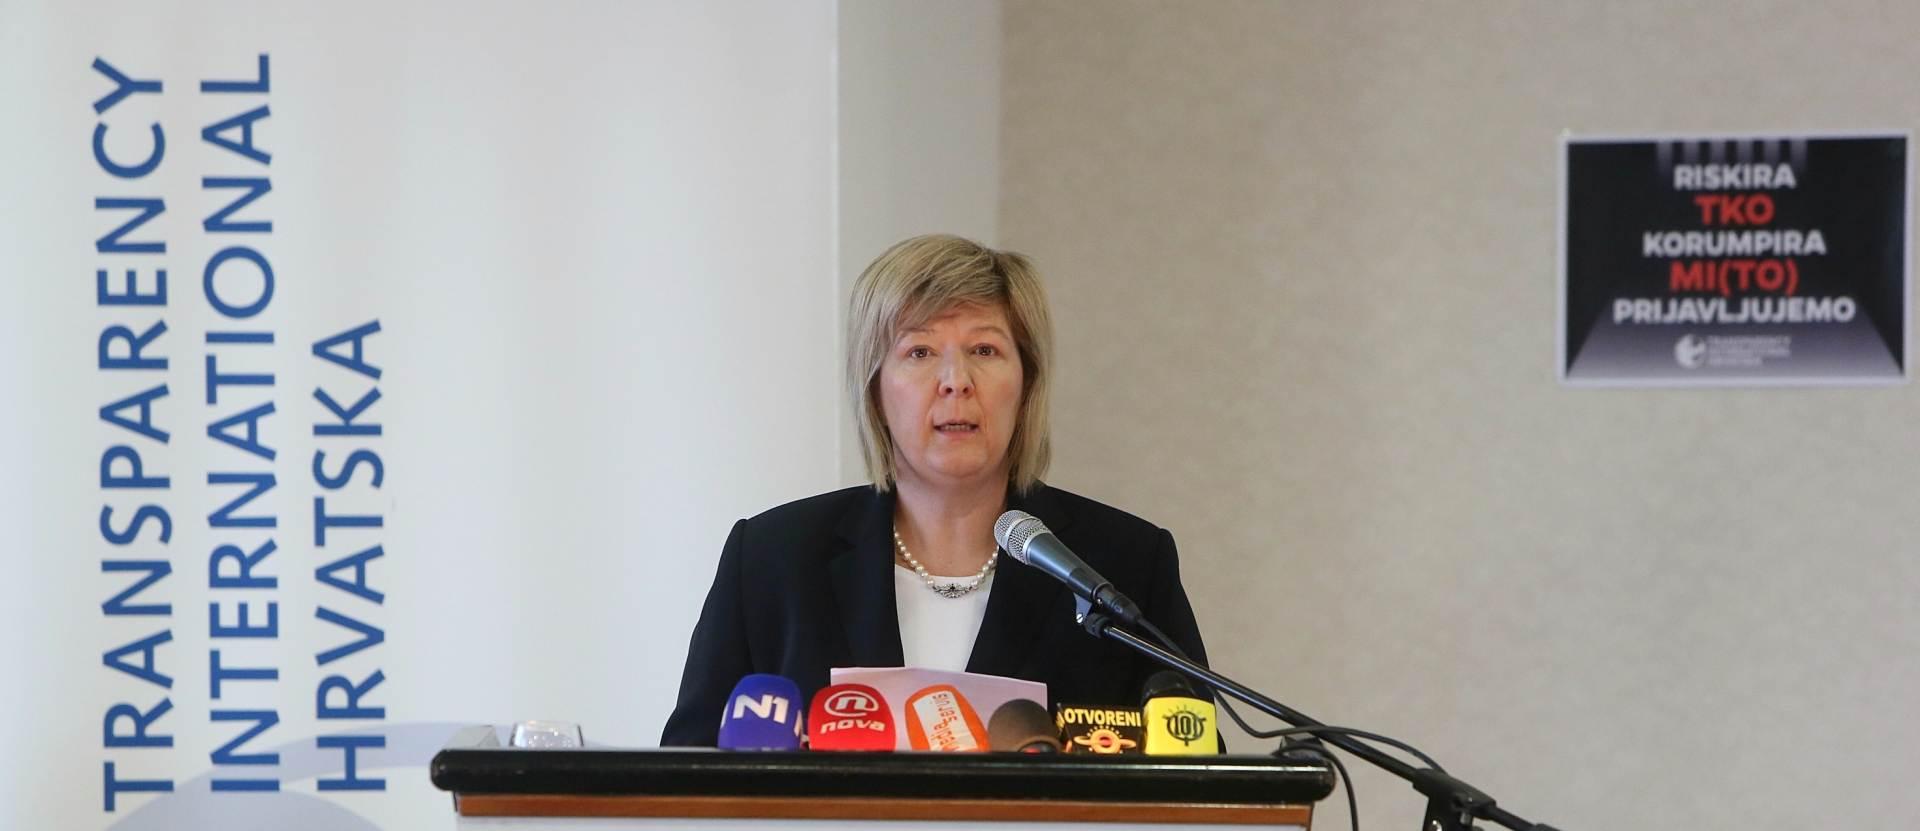 DAN ŽENA: Transparency International Hrvatska poziva na zalaganje za jednaka prava žena